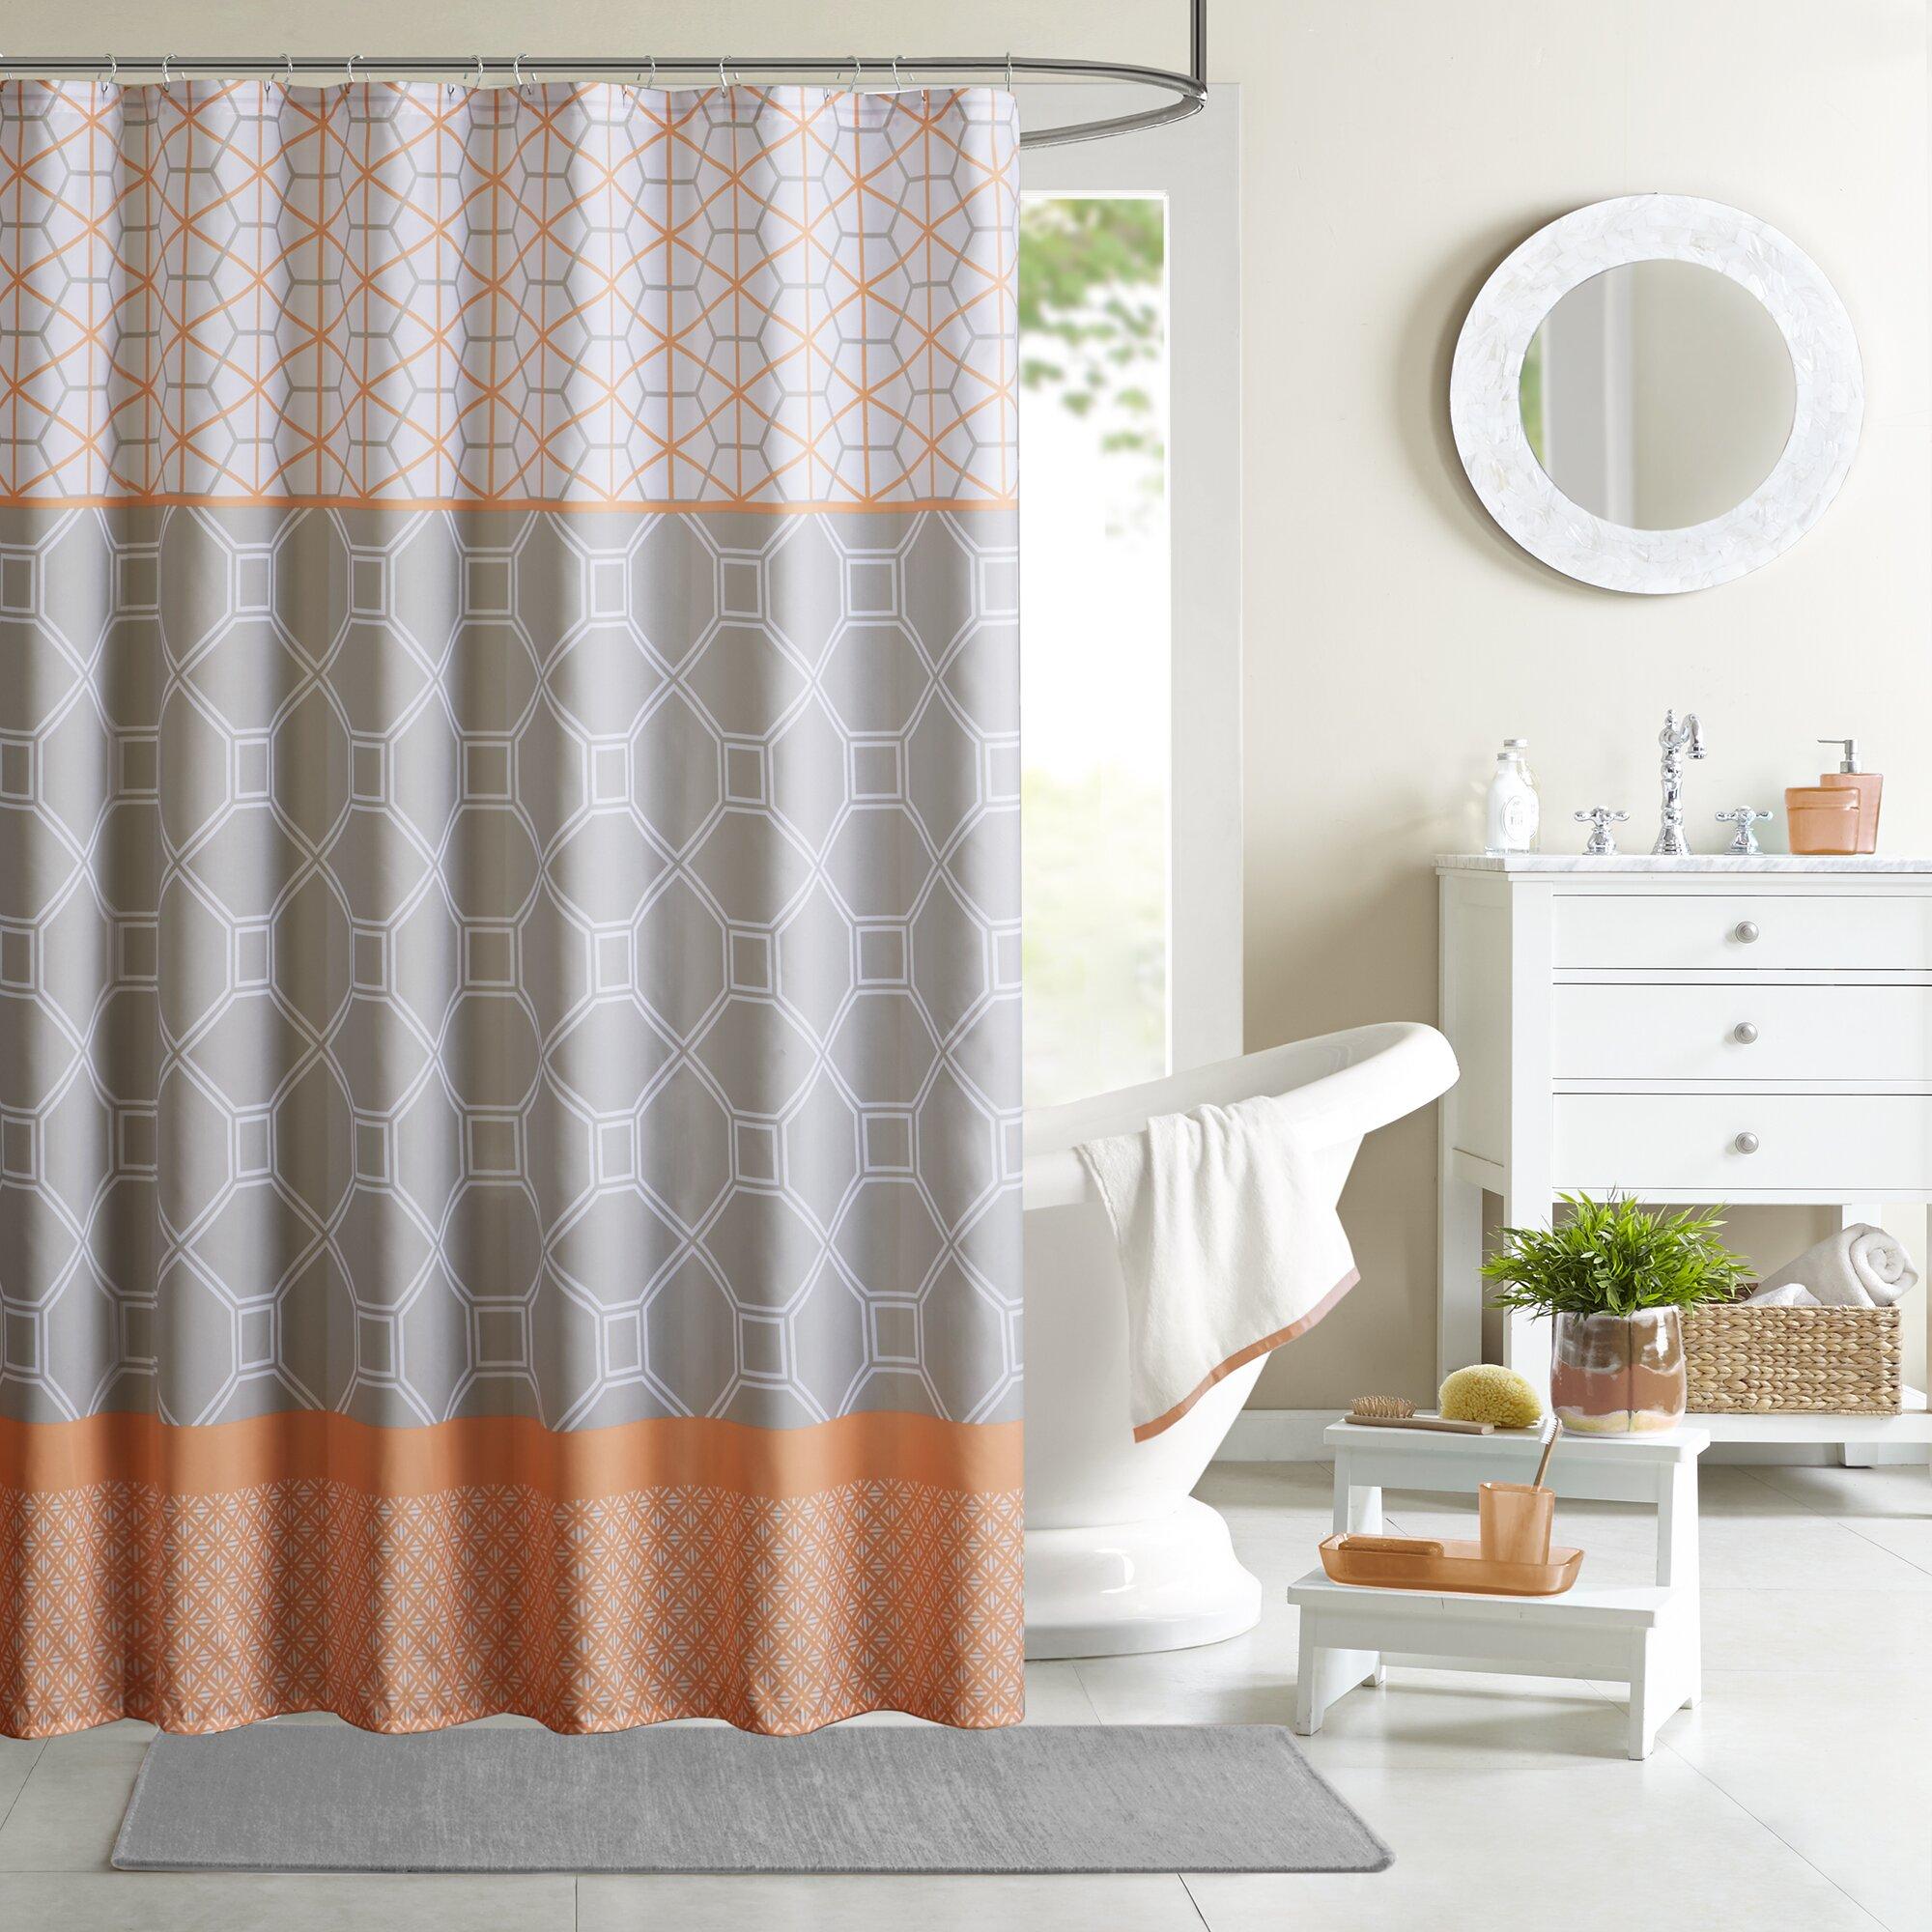 Chevron bathroom sets with shower curtain and rugs - Clara Microfiber Shower Curtain